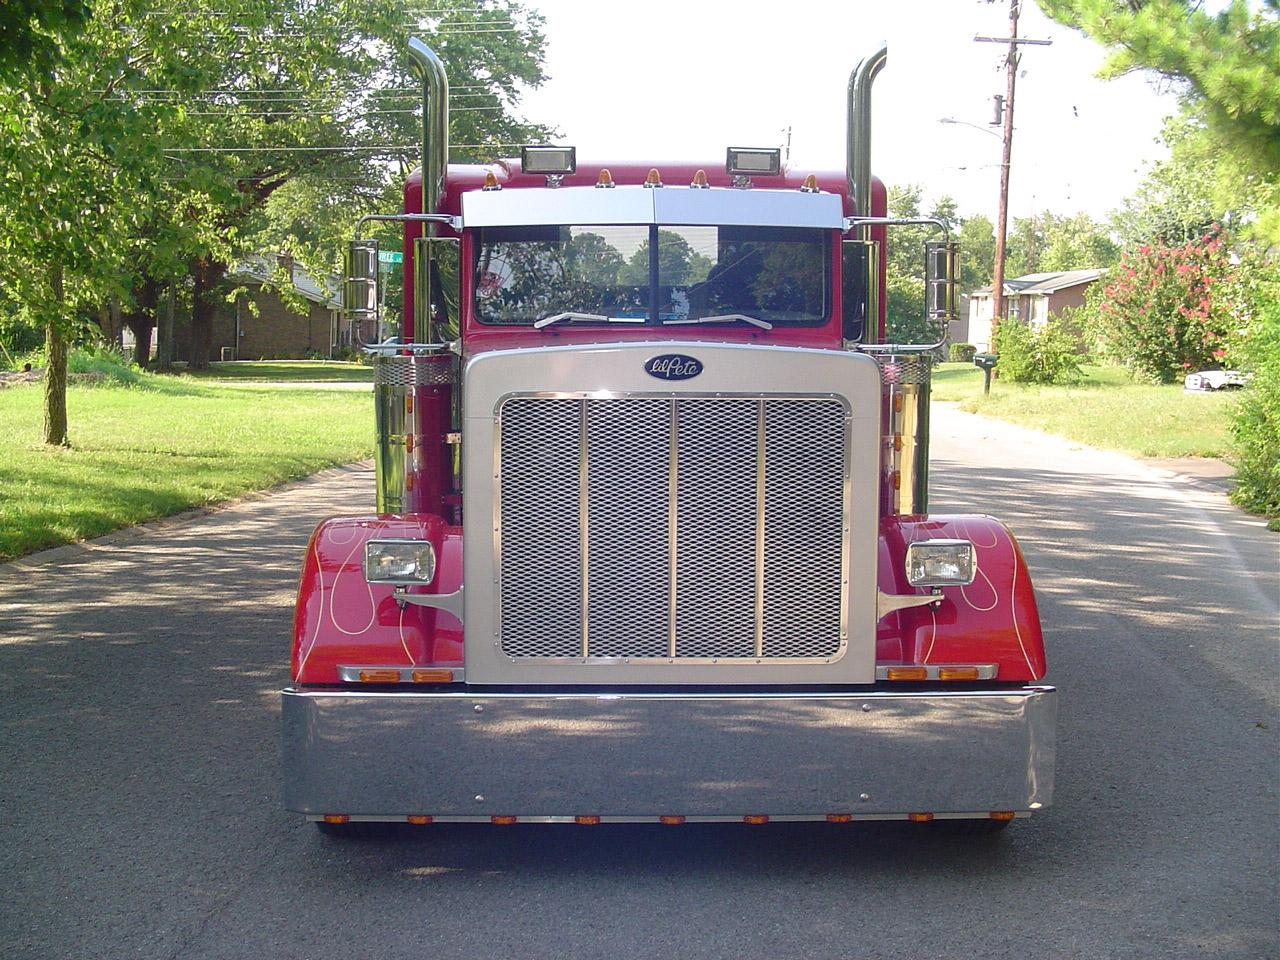 Lil big rig converting pick ups into mini semi tractors autoevolution